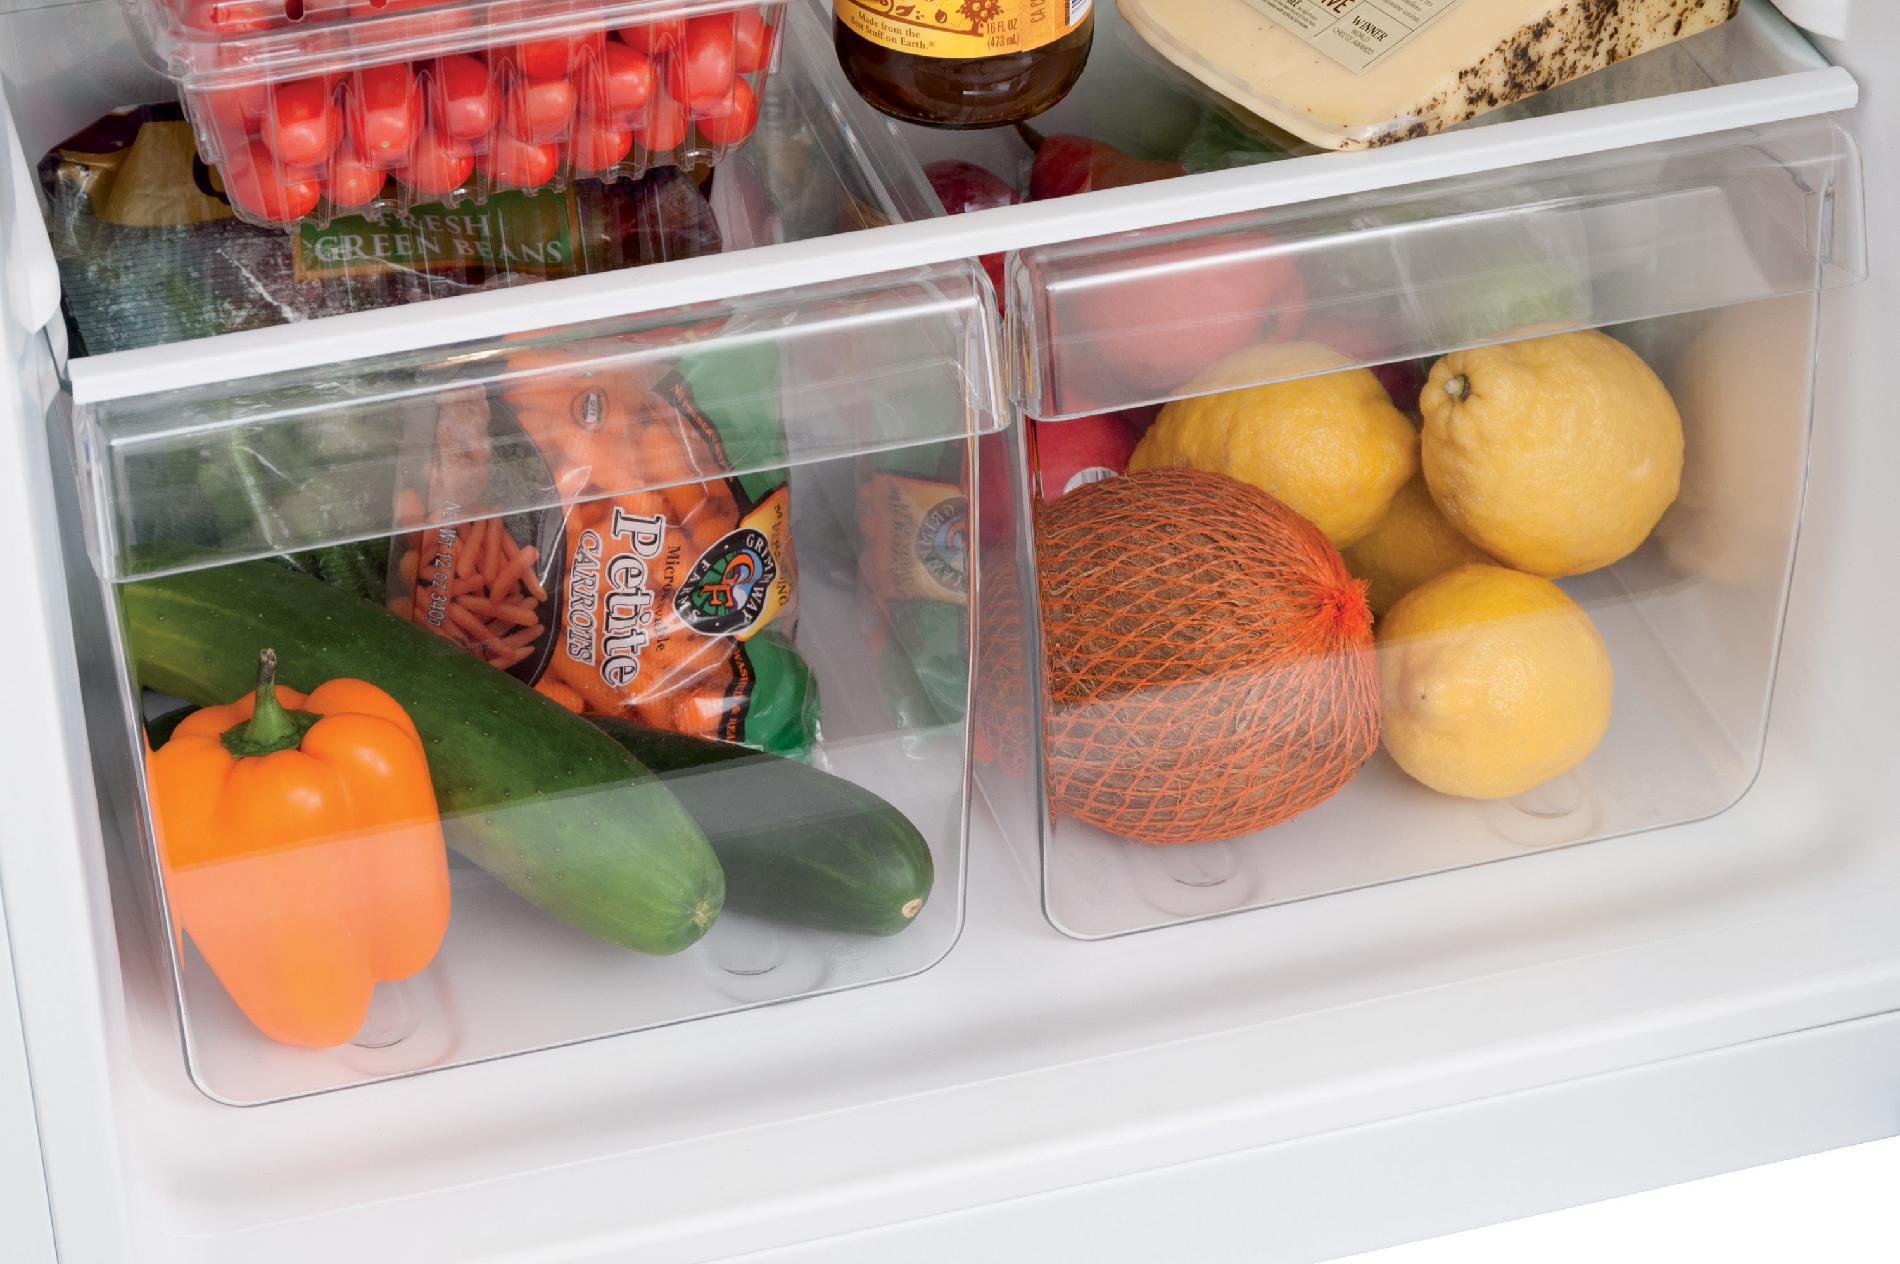 Frigidaire 11.5 cu. ft. Top-Freezer Refrigerator - Silver Mist